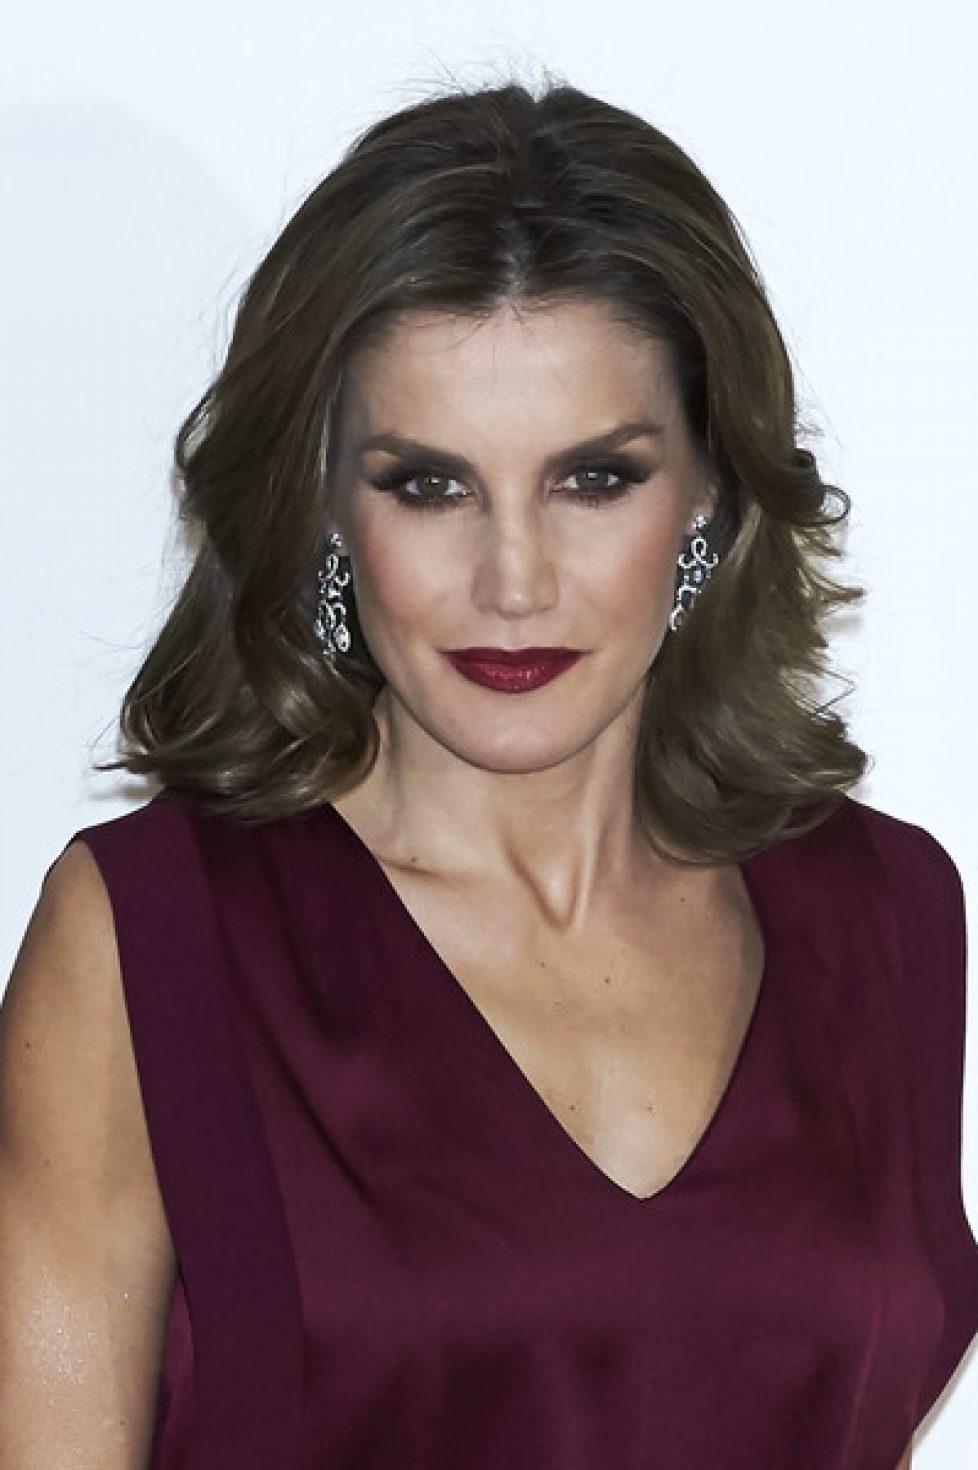 Spanish+Royals+Attend+Dinner+Honouring+Journalism+cKzBbt681dQl